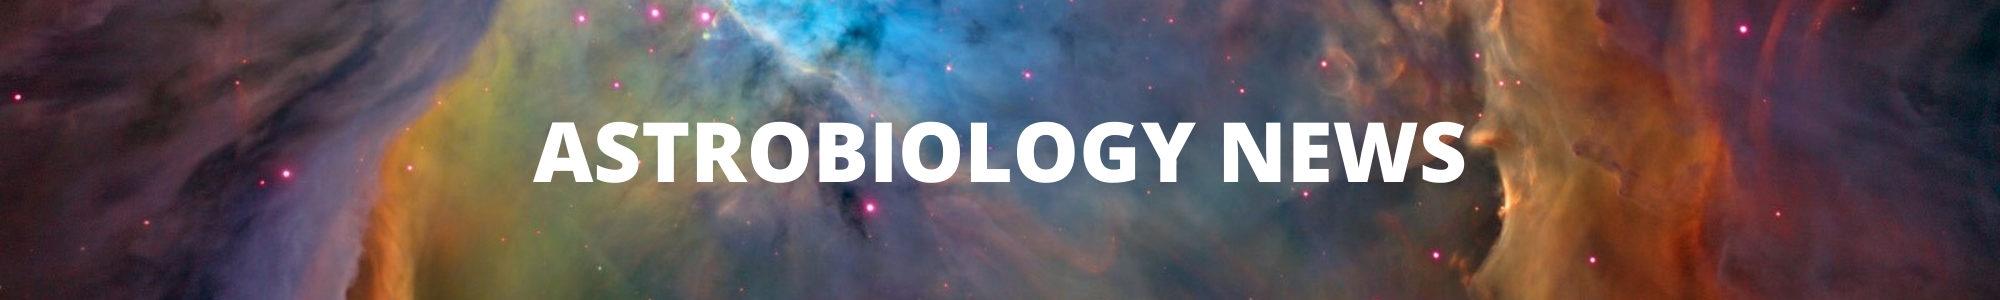 Astrobiology News